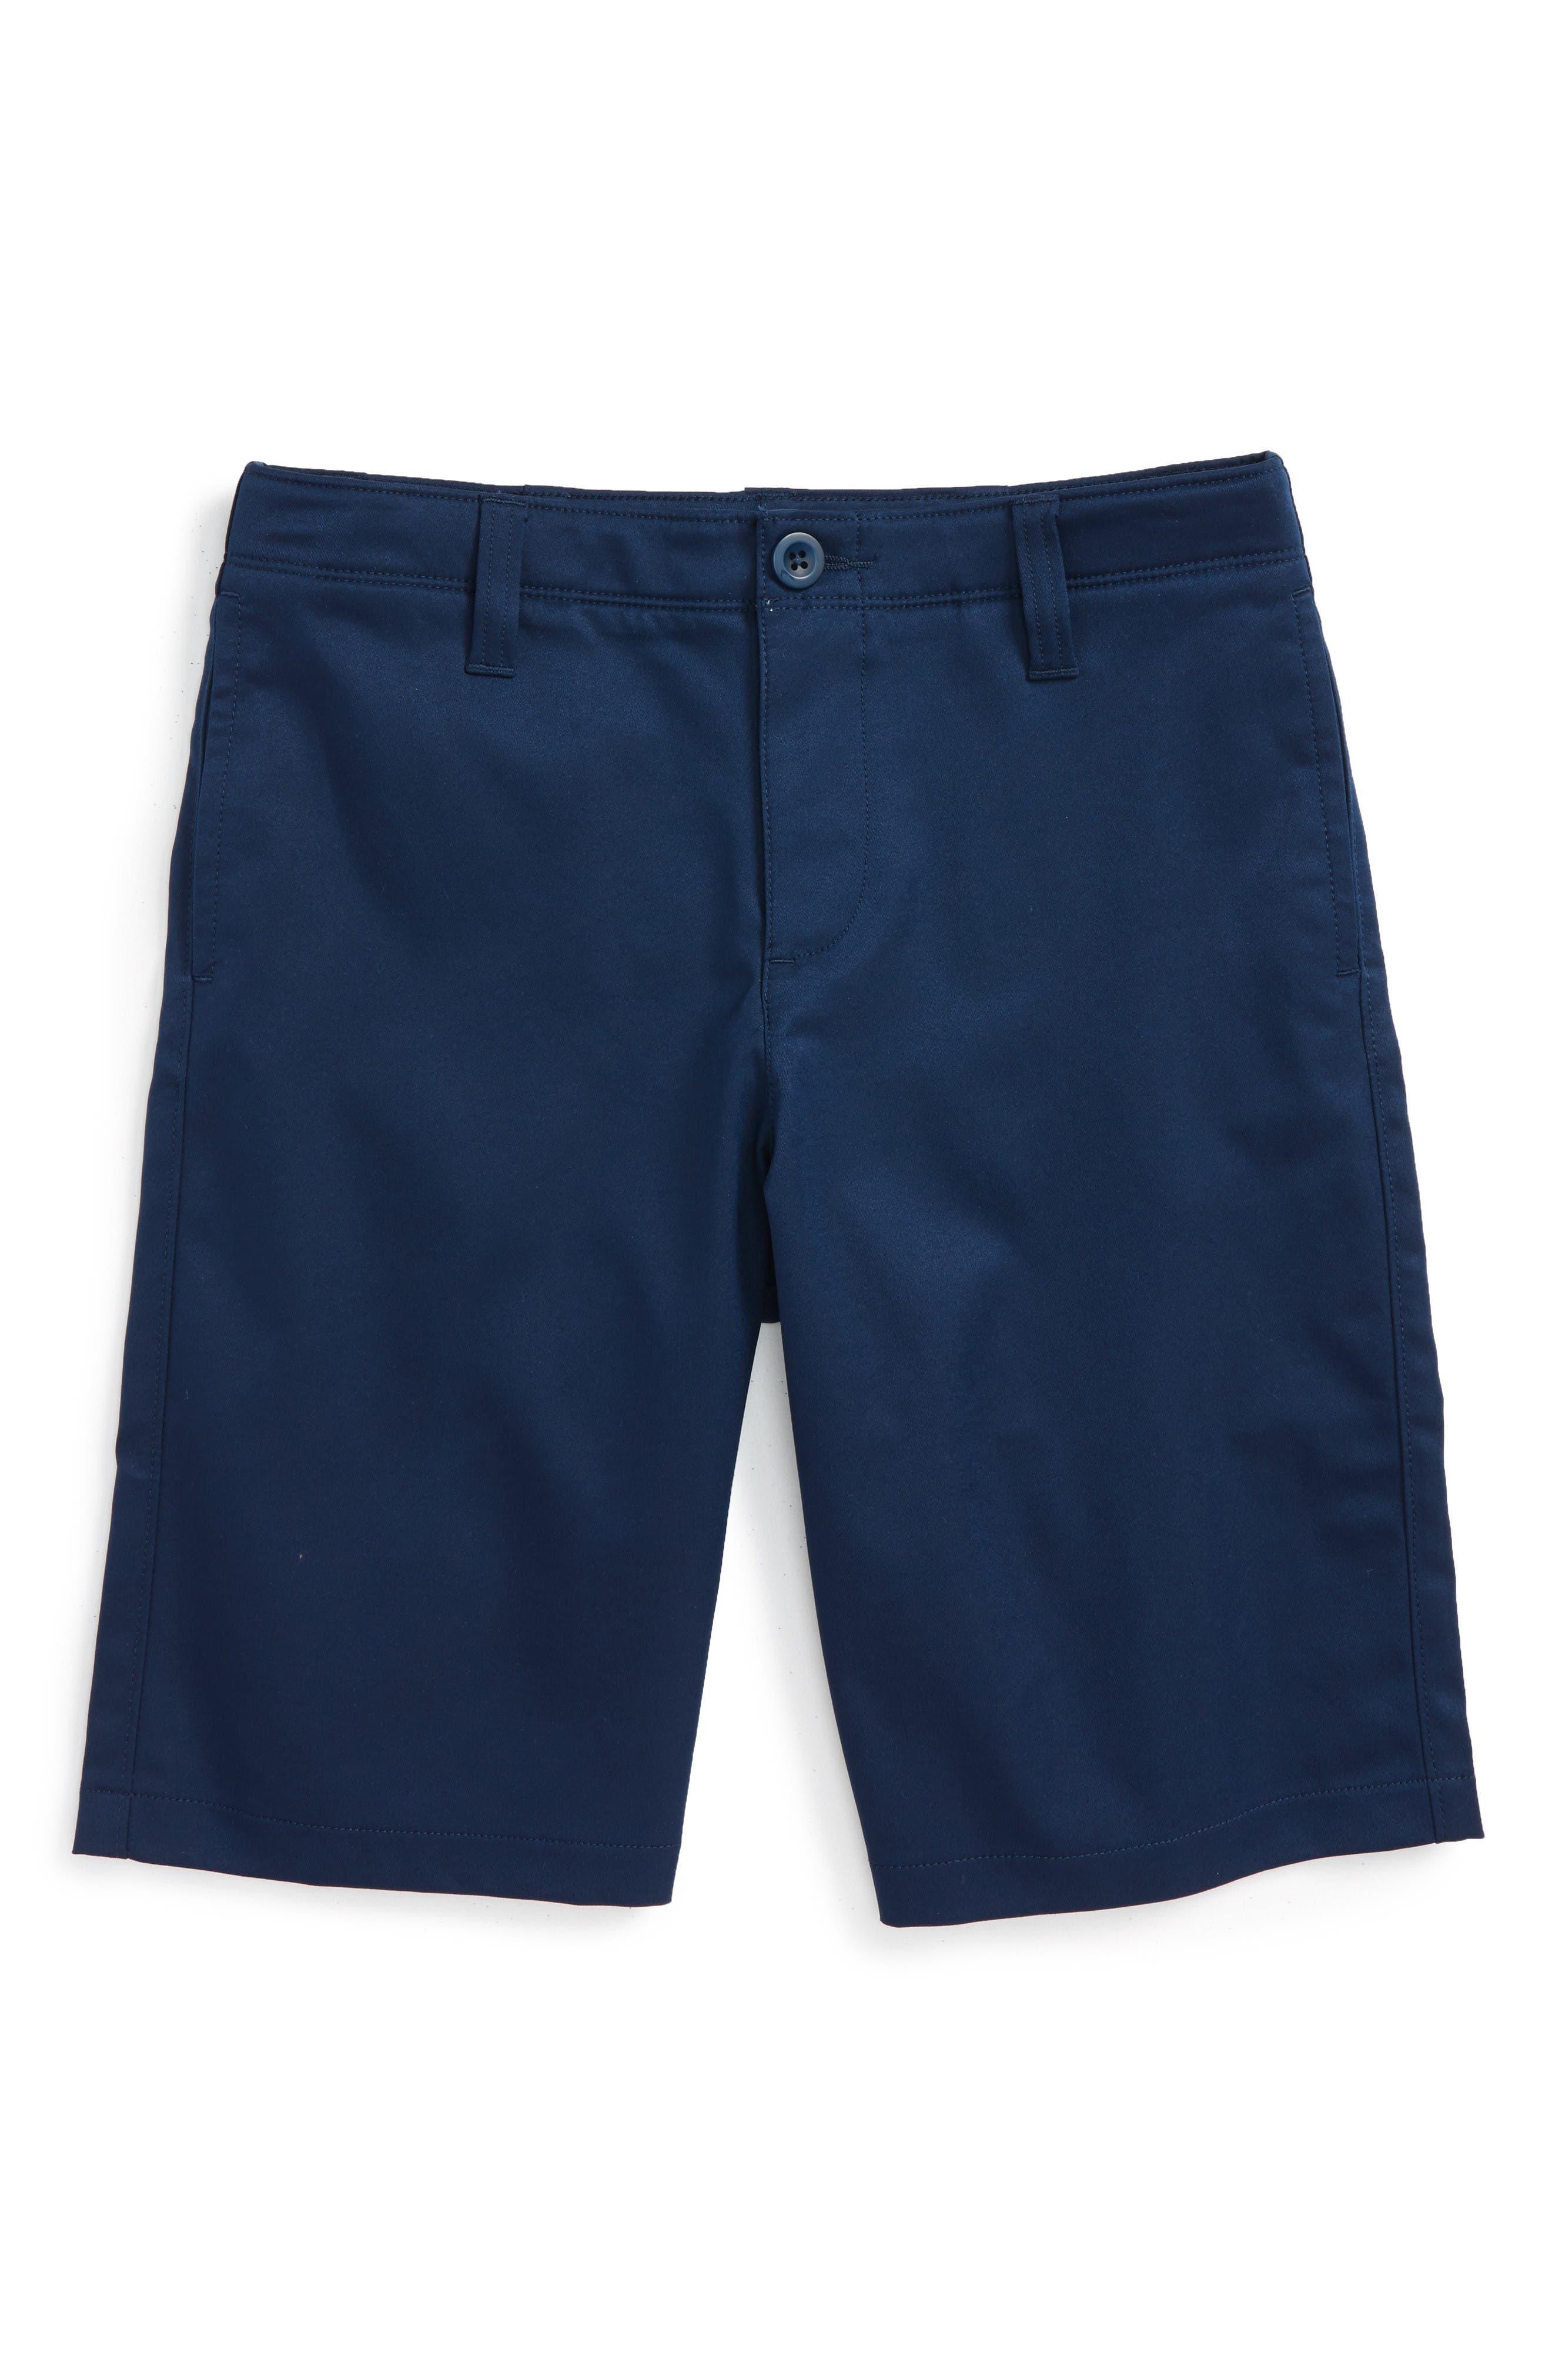 Under Armour Match Play Shorts (Big Boys)